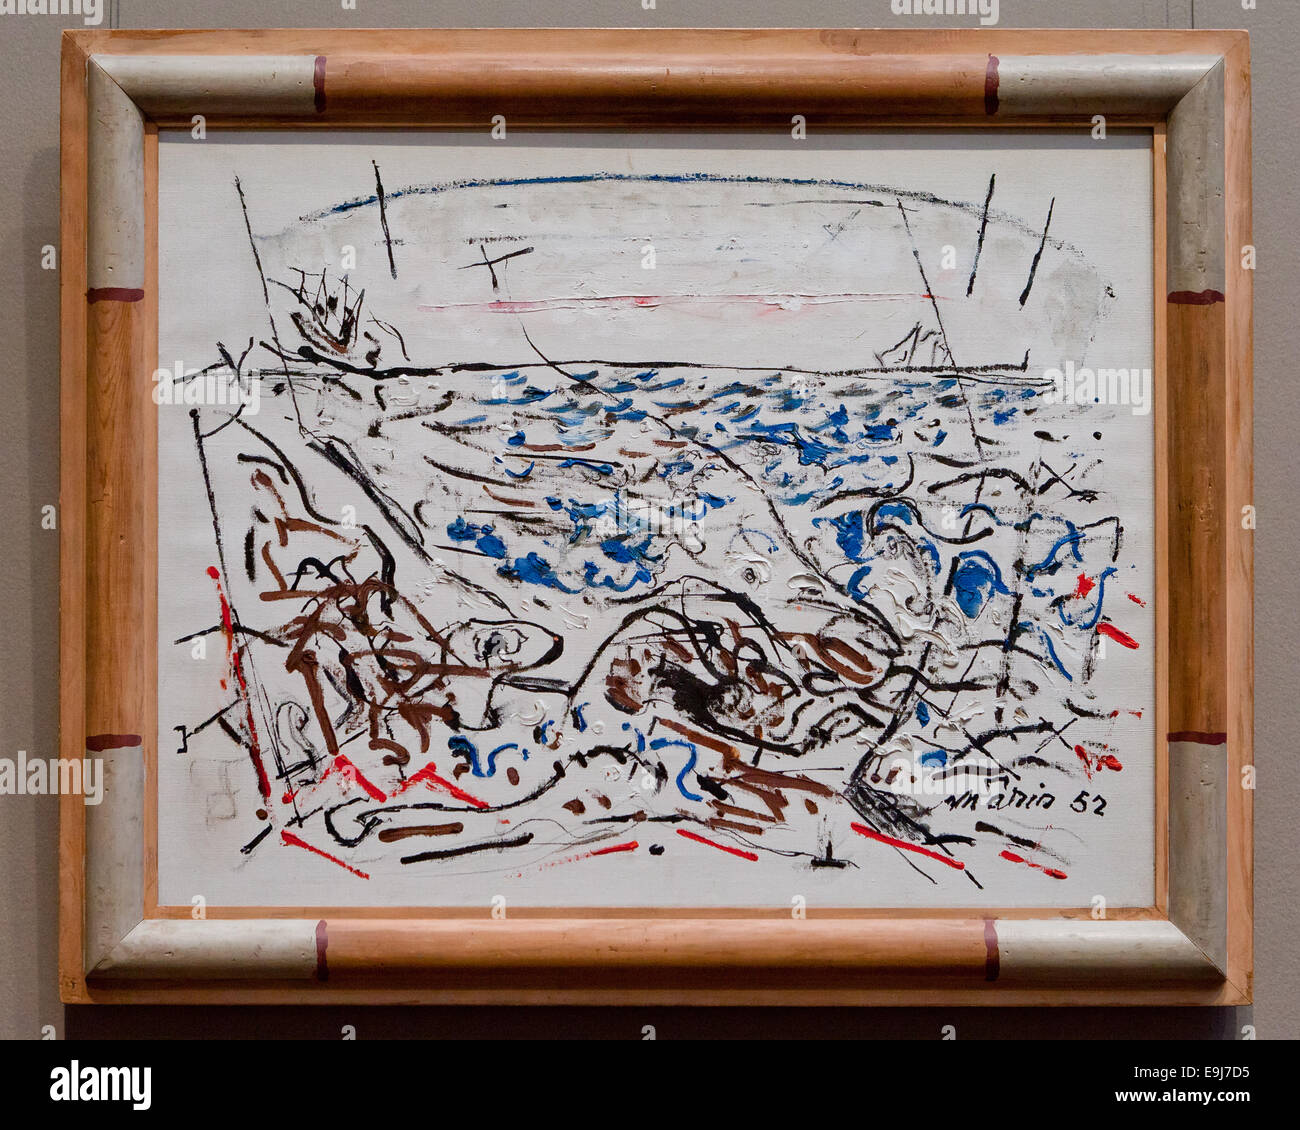 The Written Sea by John Marin, 1952 - Stock Image